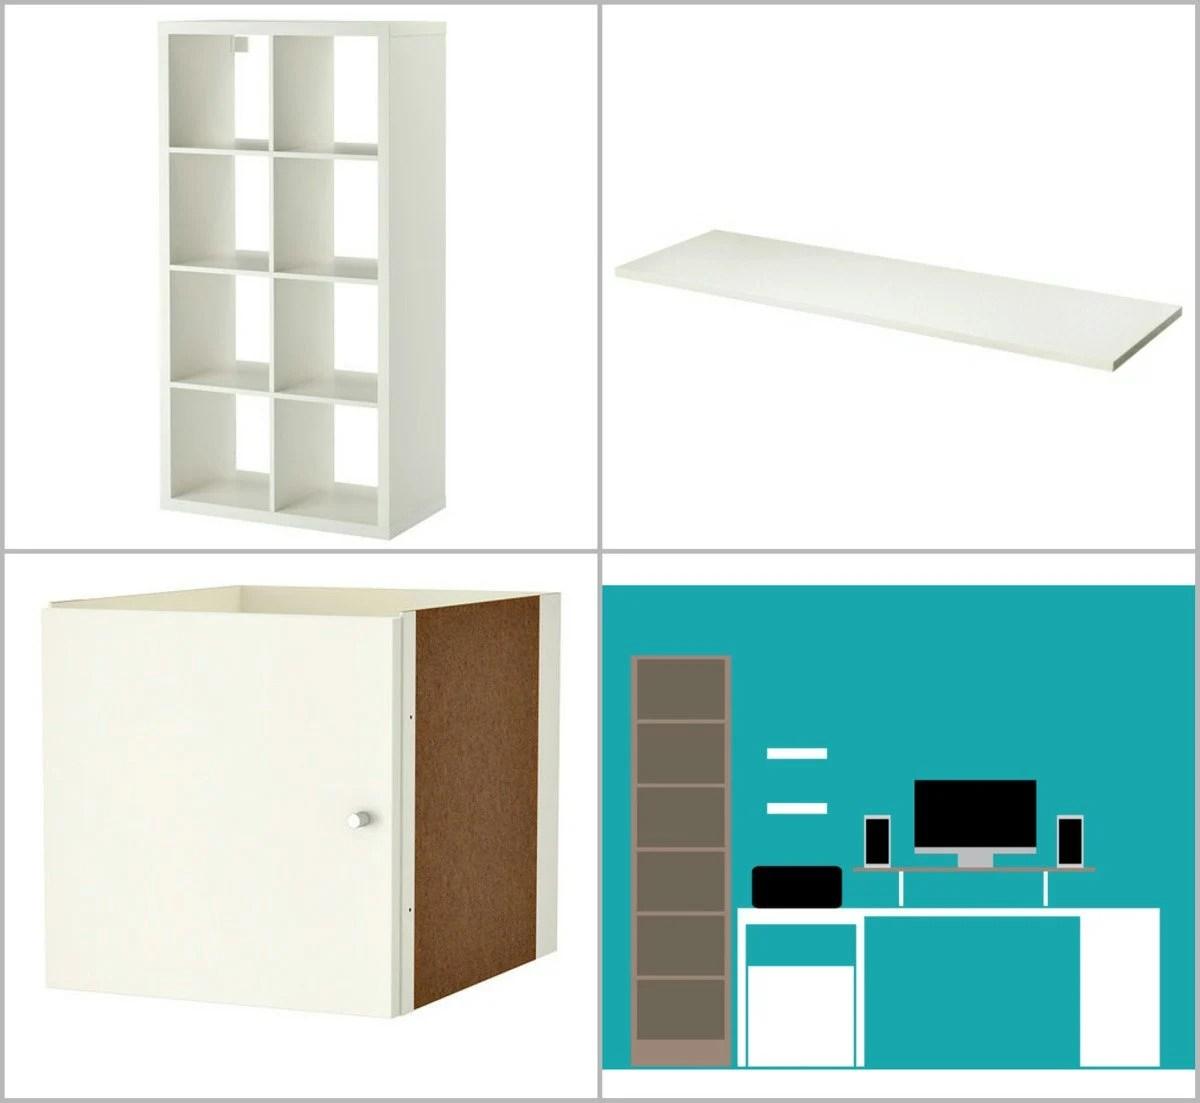 ikea kallax upgrade meuble 6 cases ikea do deco pod de. Black Bedroom Furniture Sets. Home Design Ideas